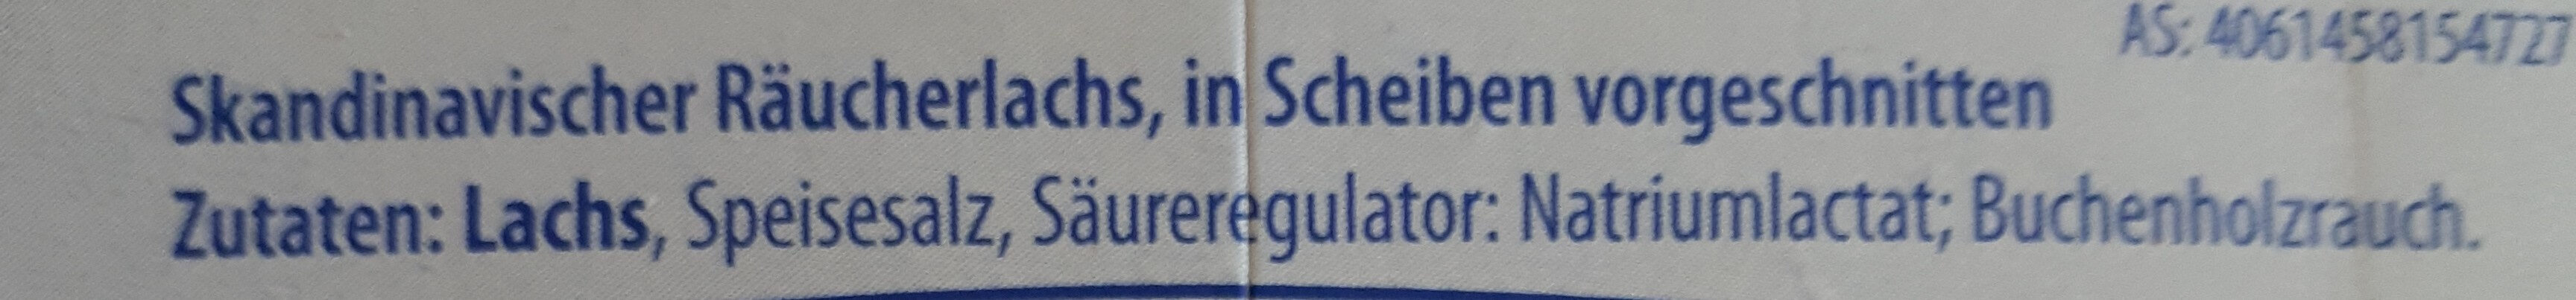 Skandinavischer Räucherlachs - Ingrédients - de